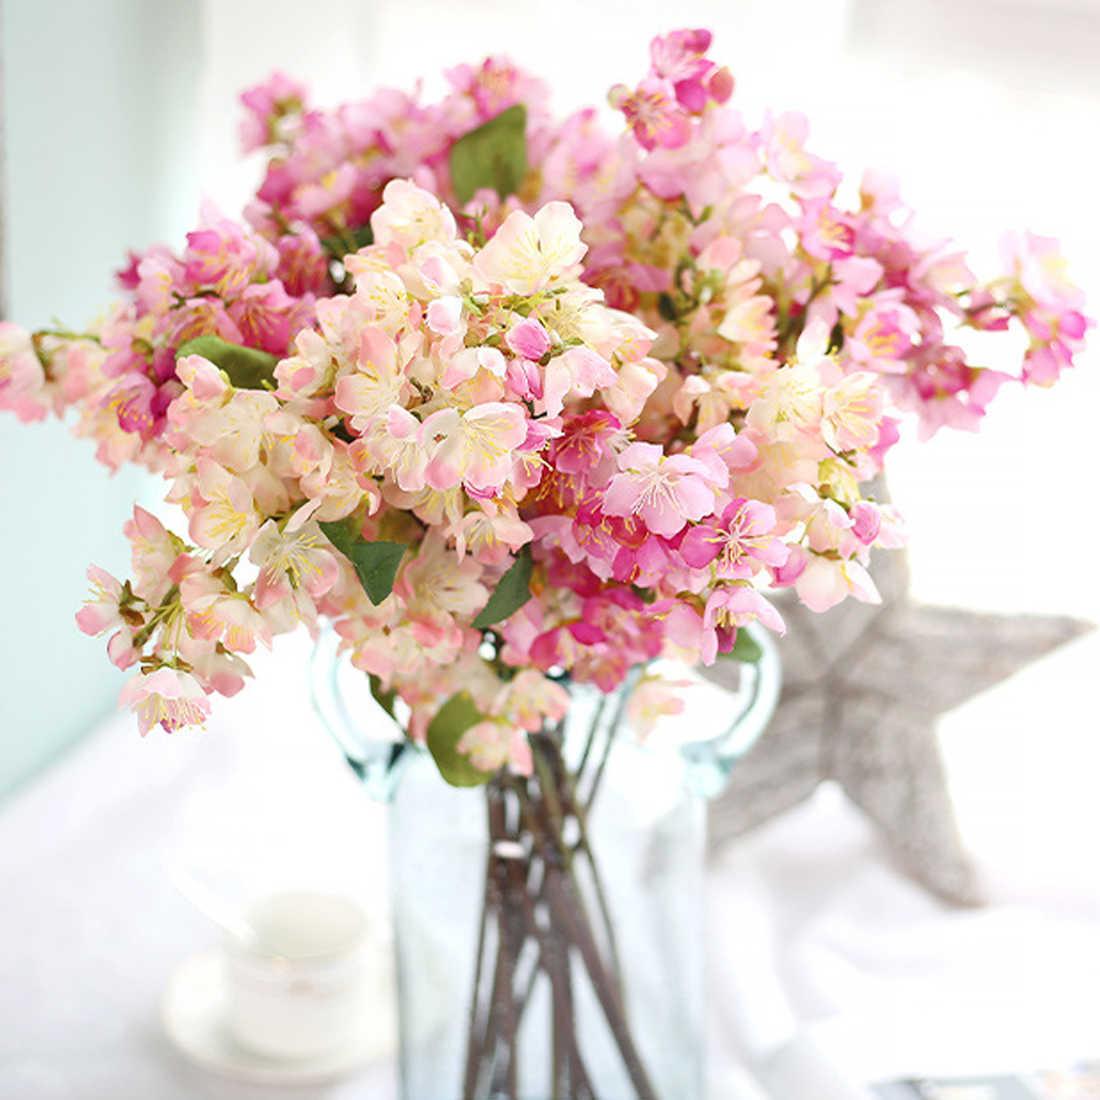 1 Bouquet Sakura Jepang Bunga Buatan Cherry Blossom Bouquet Palsu Bunga Rumah Pernikahan Pesta Dekorasi Persediaan